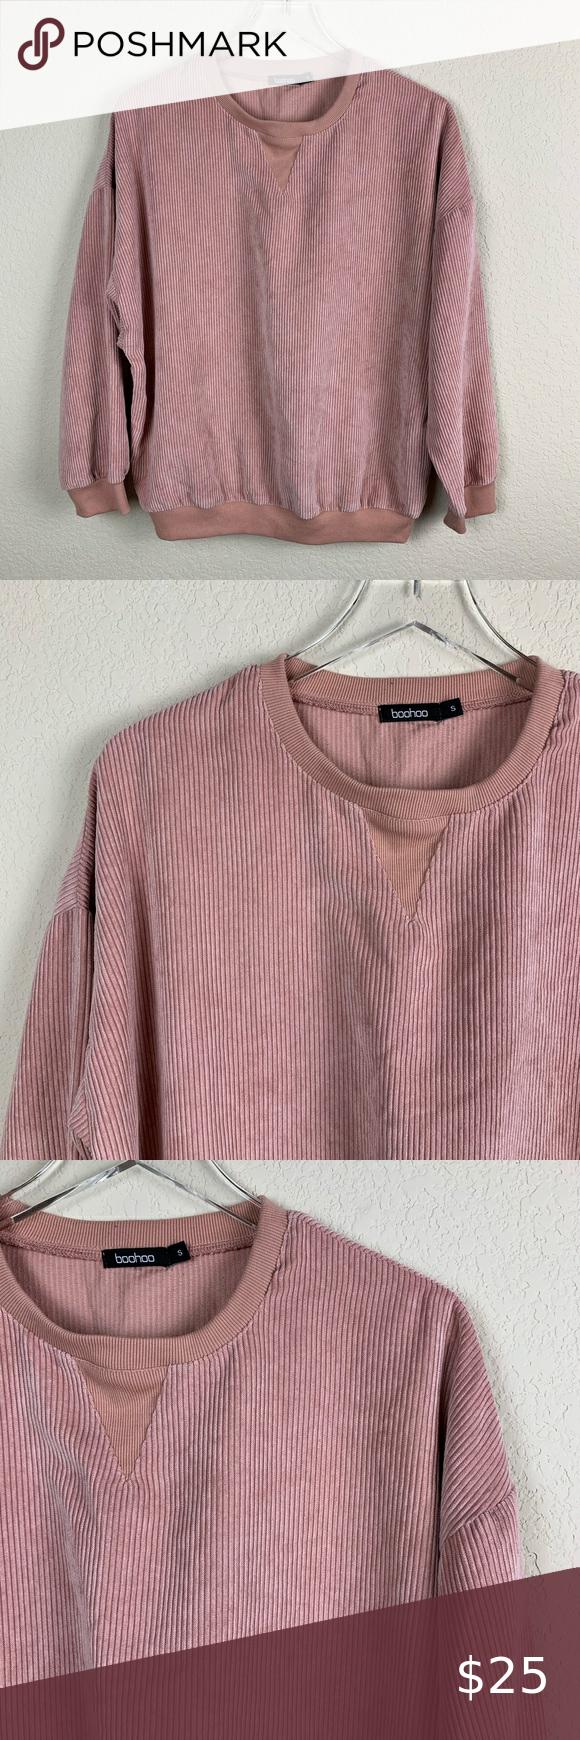 Boohoo Peach Blush Corduroy Pullover Sweatshirt Pullover Sweatshirt Boohoo Tops Sweatshirts [ 1740 x 580 Pixel ]